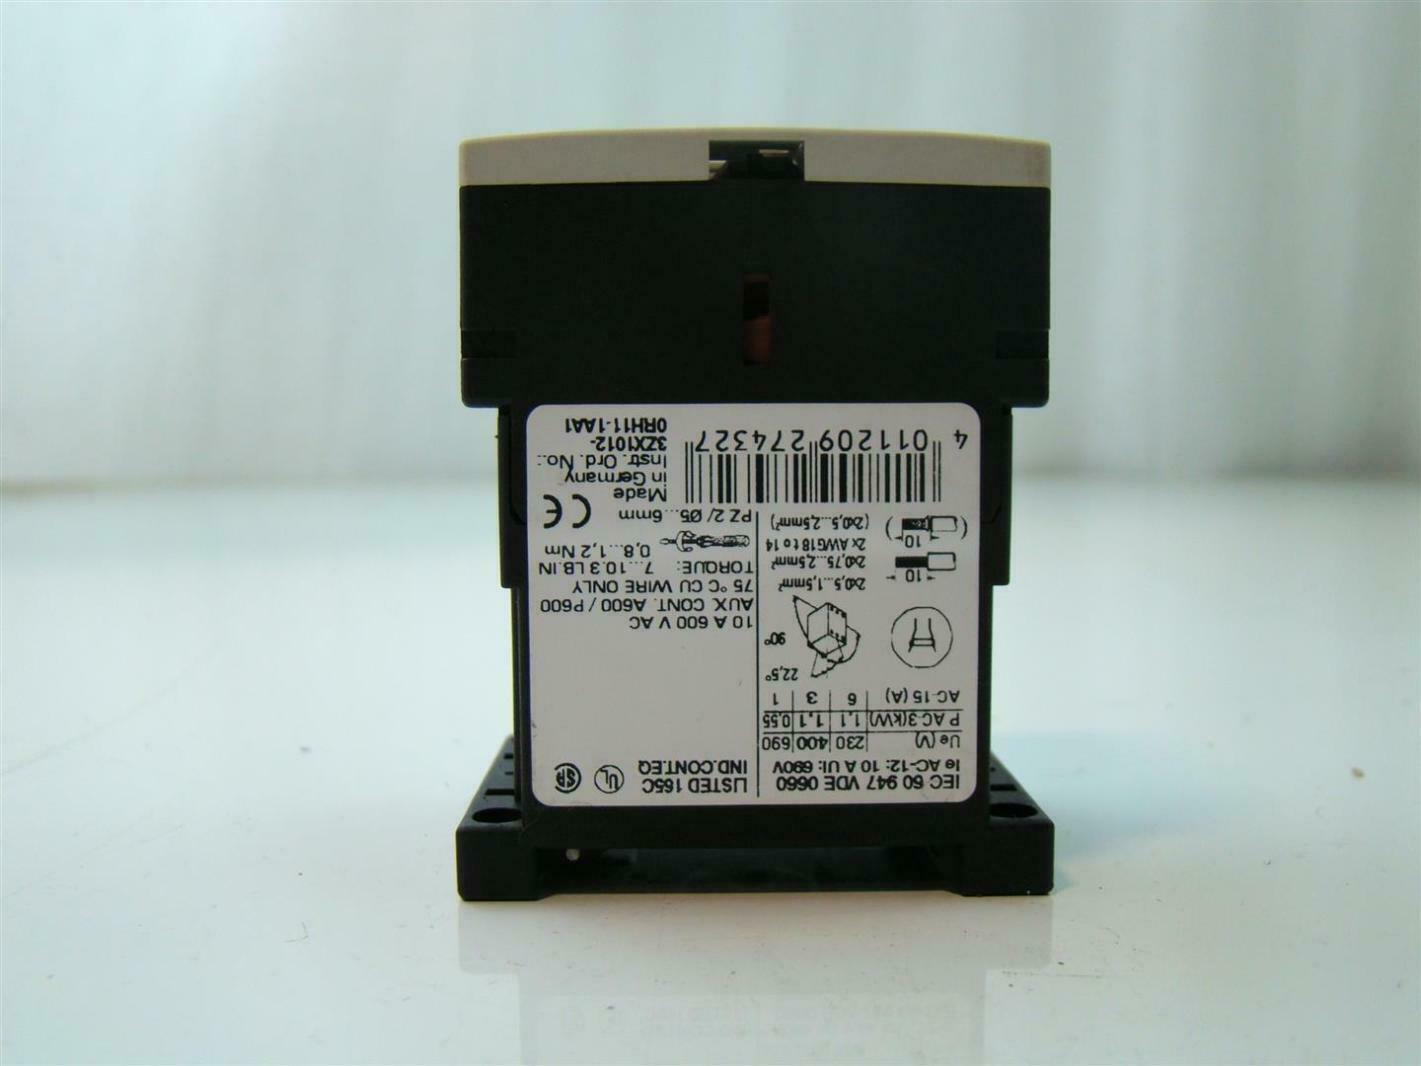 Siemens Mbk175 2p 175a 240v Main Circuit Breaker 1 Yr Waranty Ebay